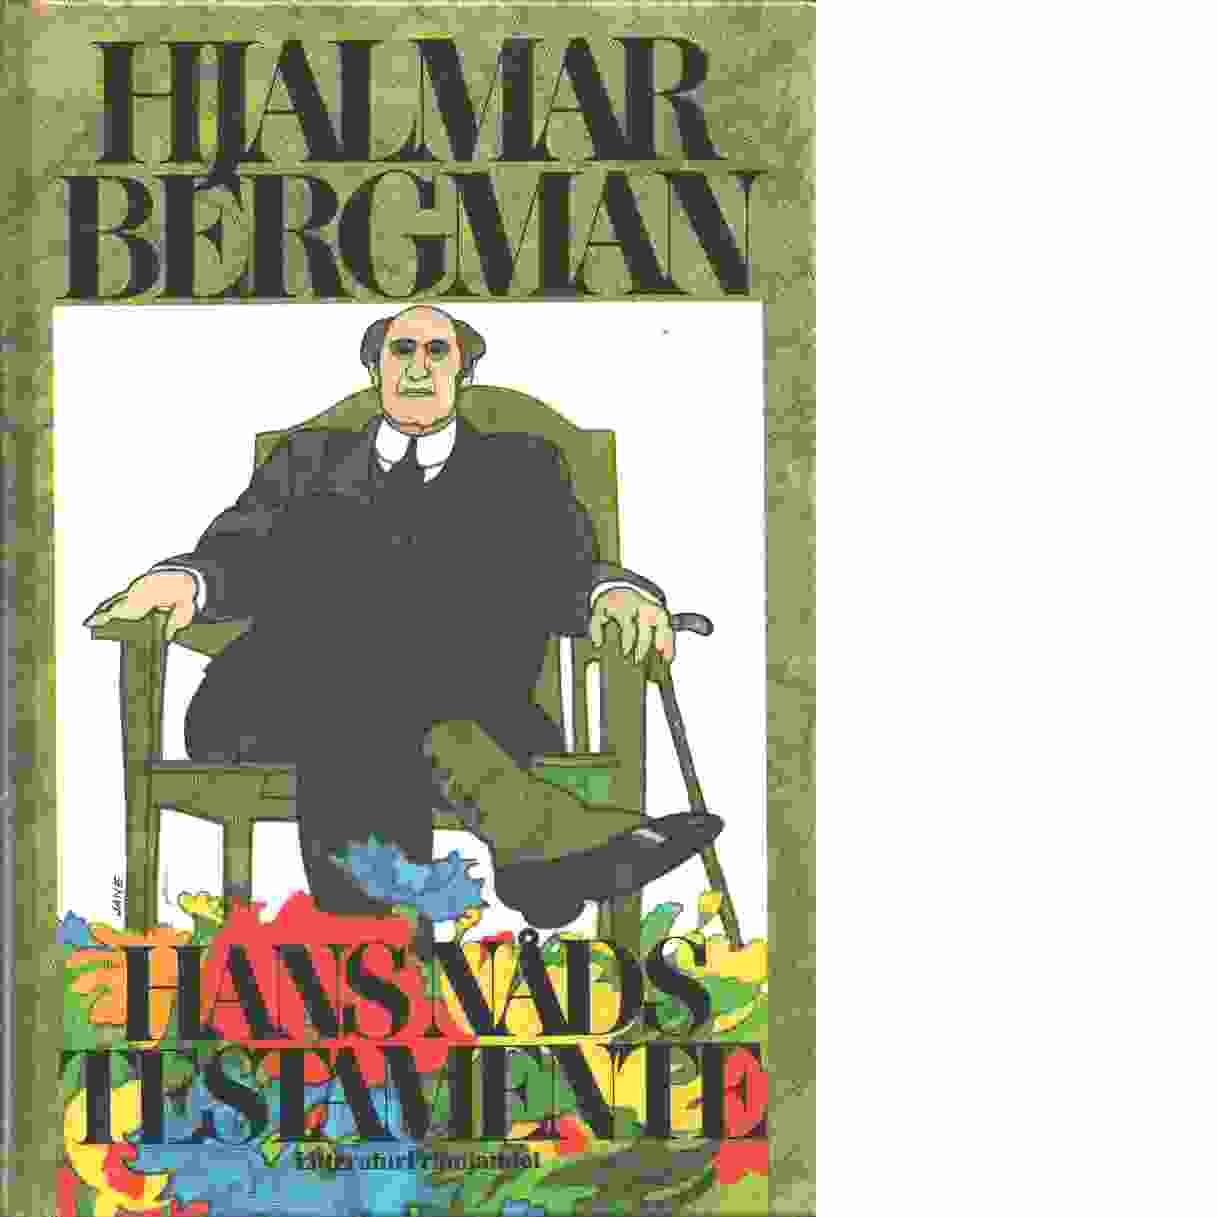 Hans nåds testamente - Bergman, Hjalmar